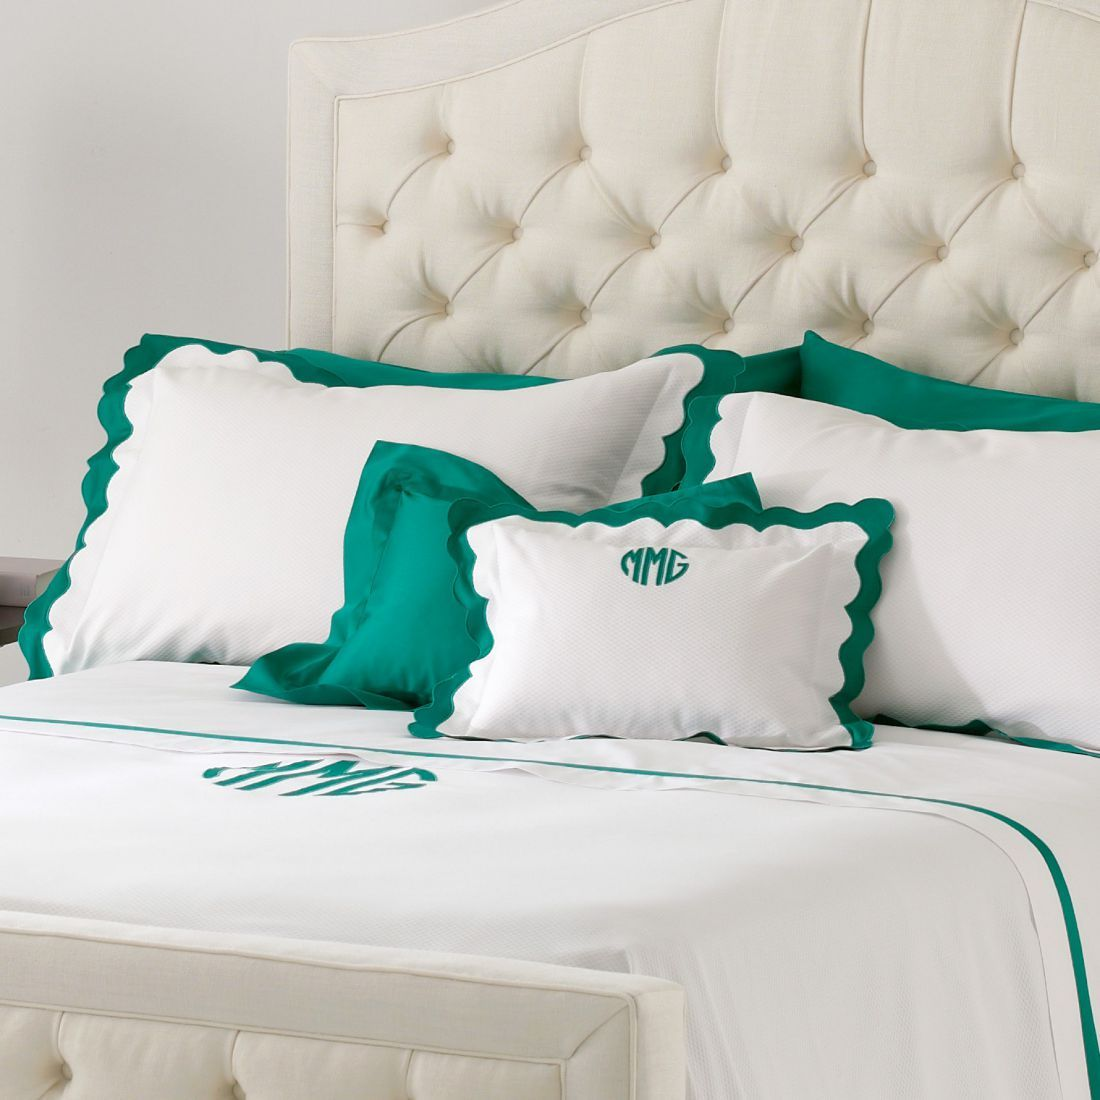 Scallop Trimmed White Coverlets U0026 Bedding   Matouk Paloma. Shown Here In  White U0026 Emerald